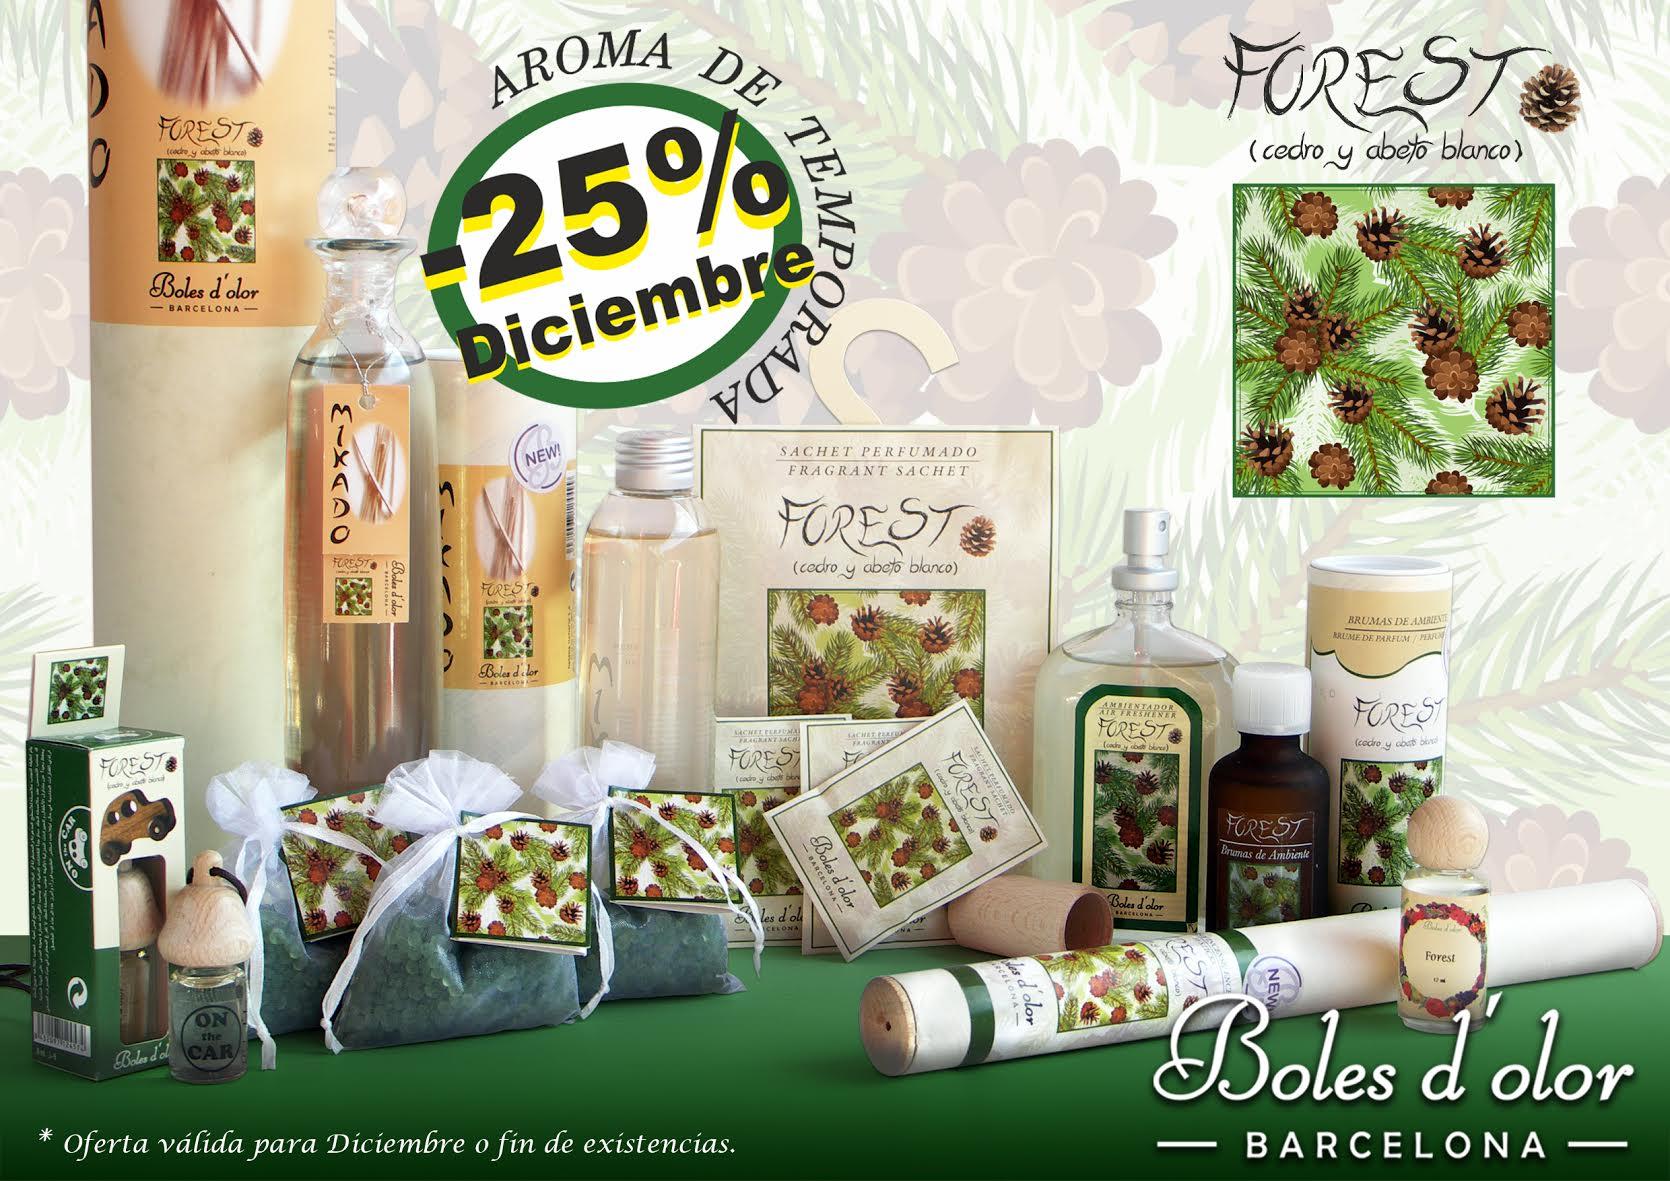 Forest: aroma del mes de Boles d'Olor con 25% de descuento.